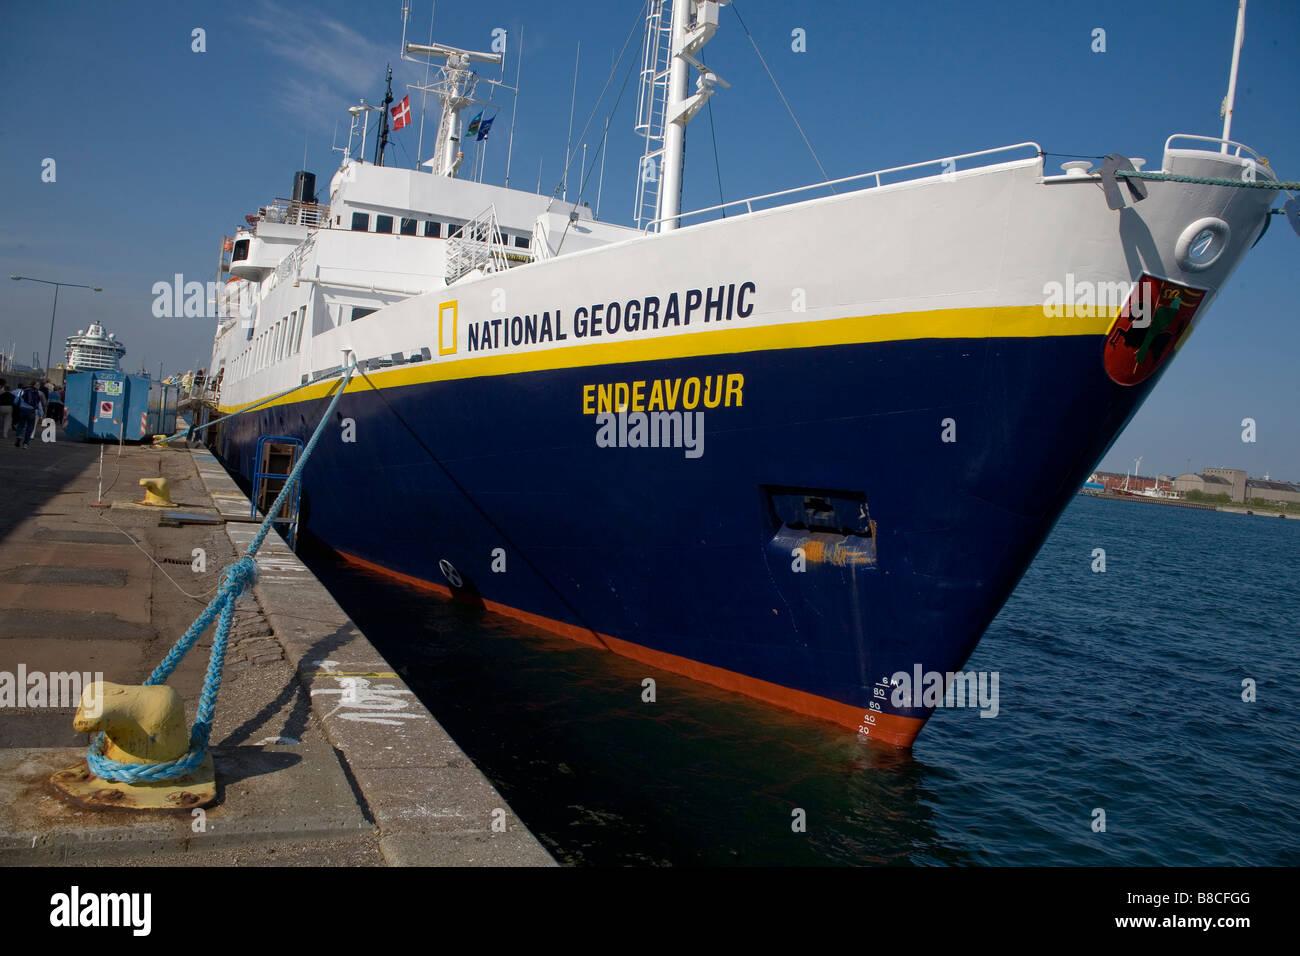 National Geographic Endeavour moored in Copenhagen, Denmark - Stock Image